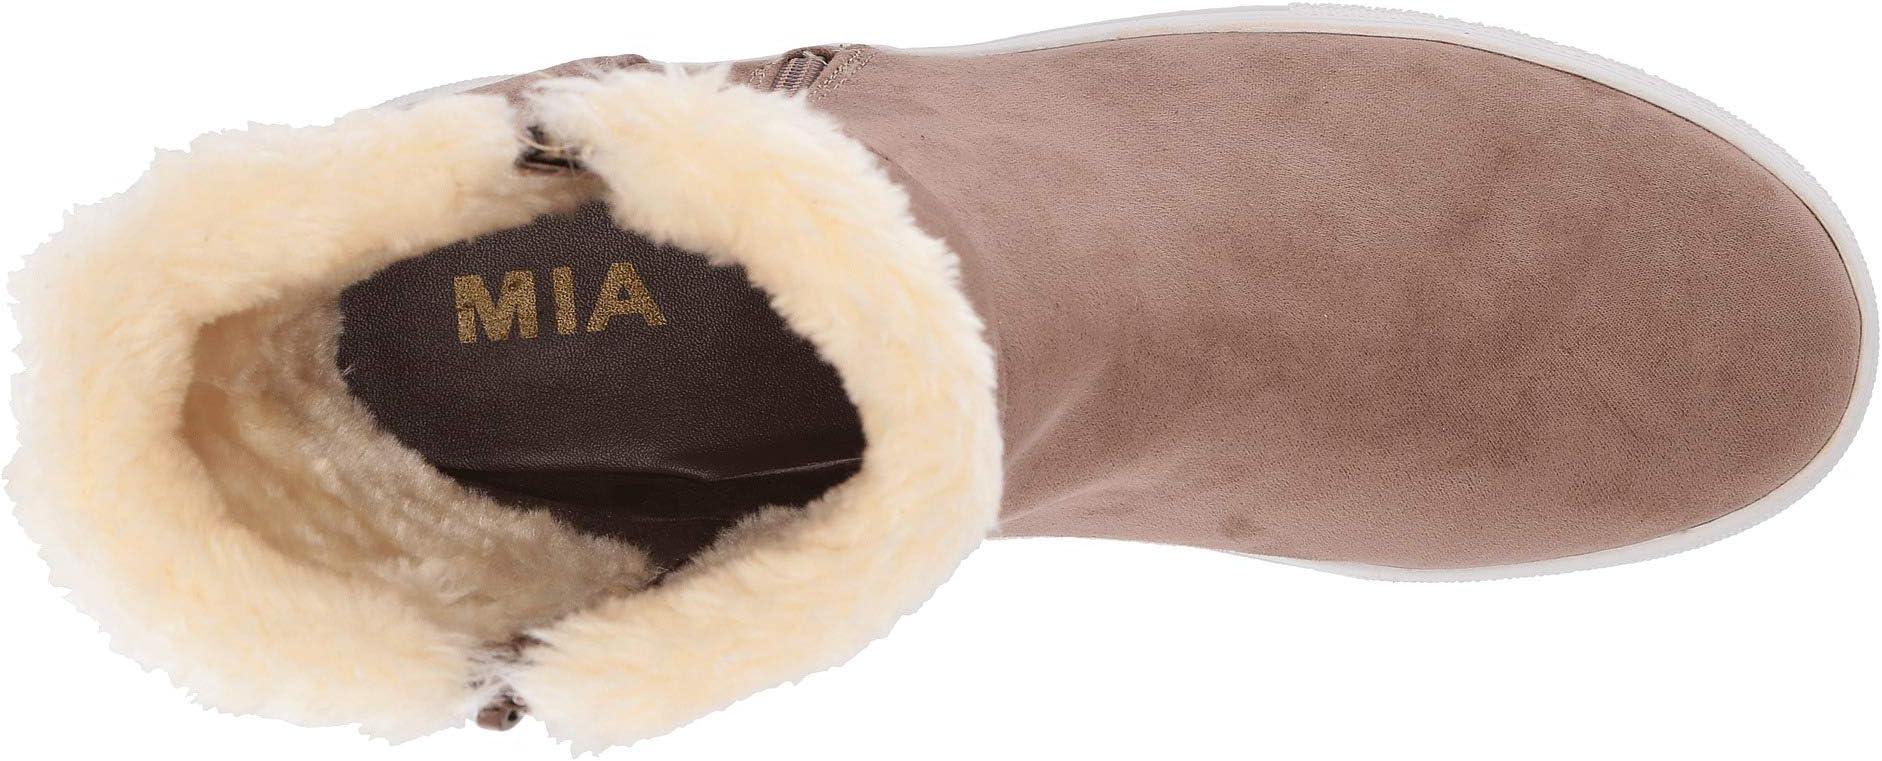 MIA Merion   Women's shoes   2020 Newest